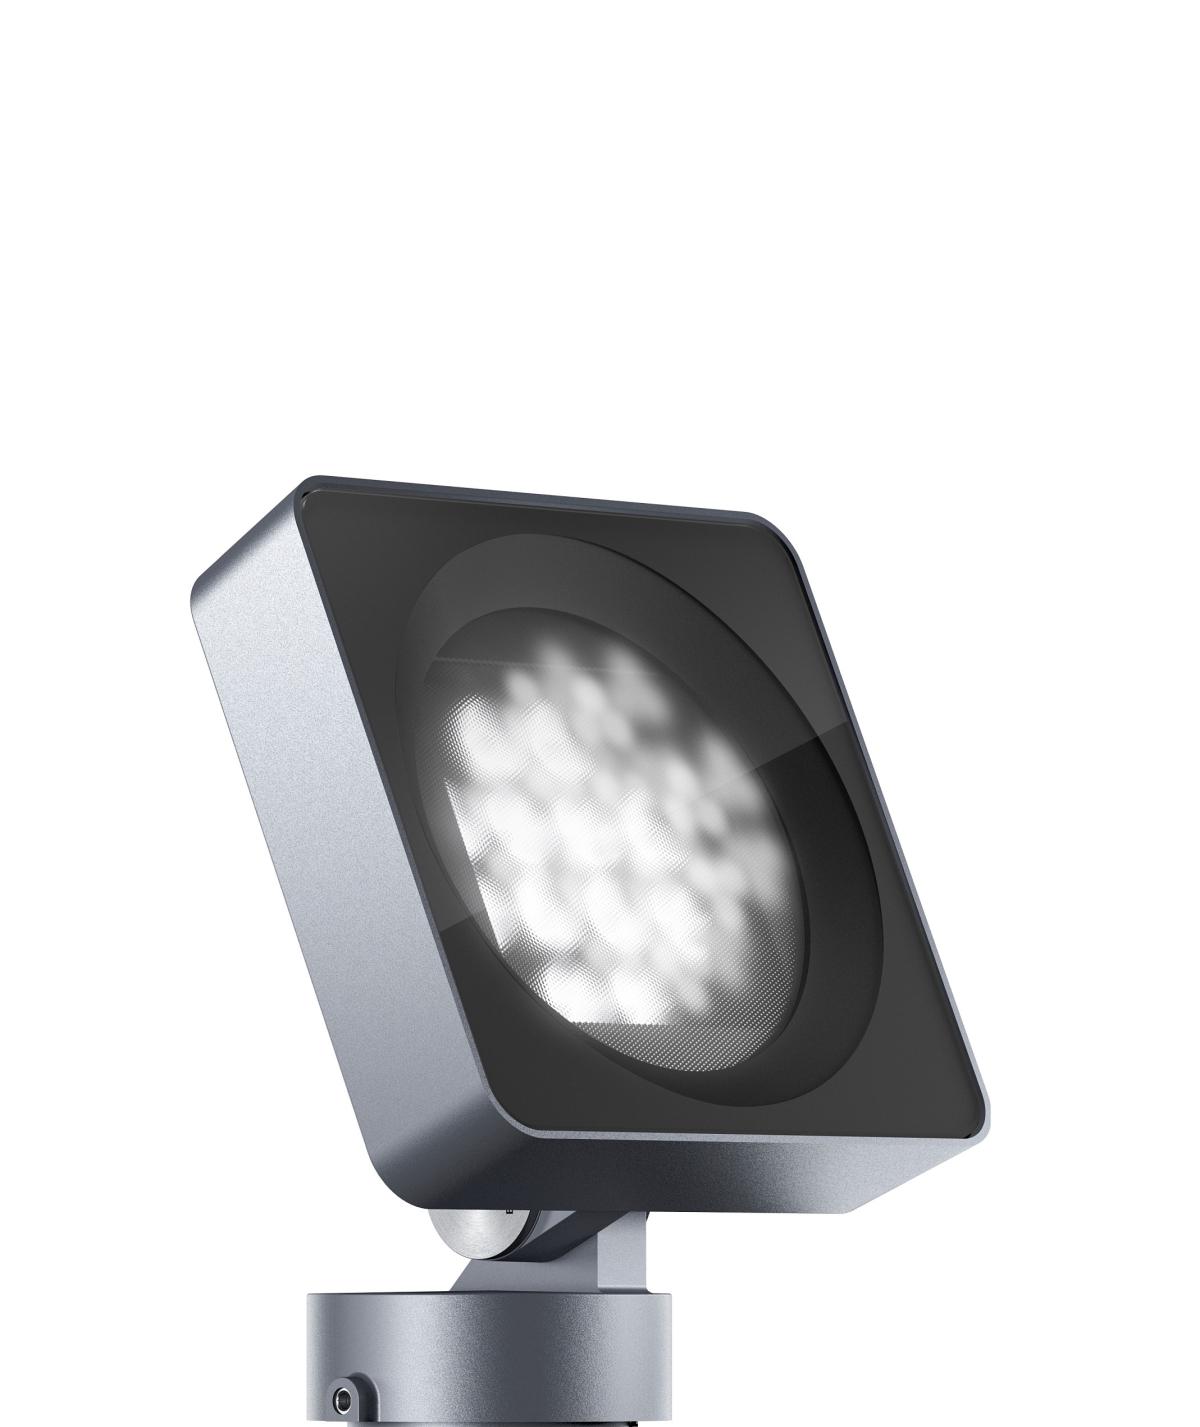 Erco lightscan design eur 01